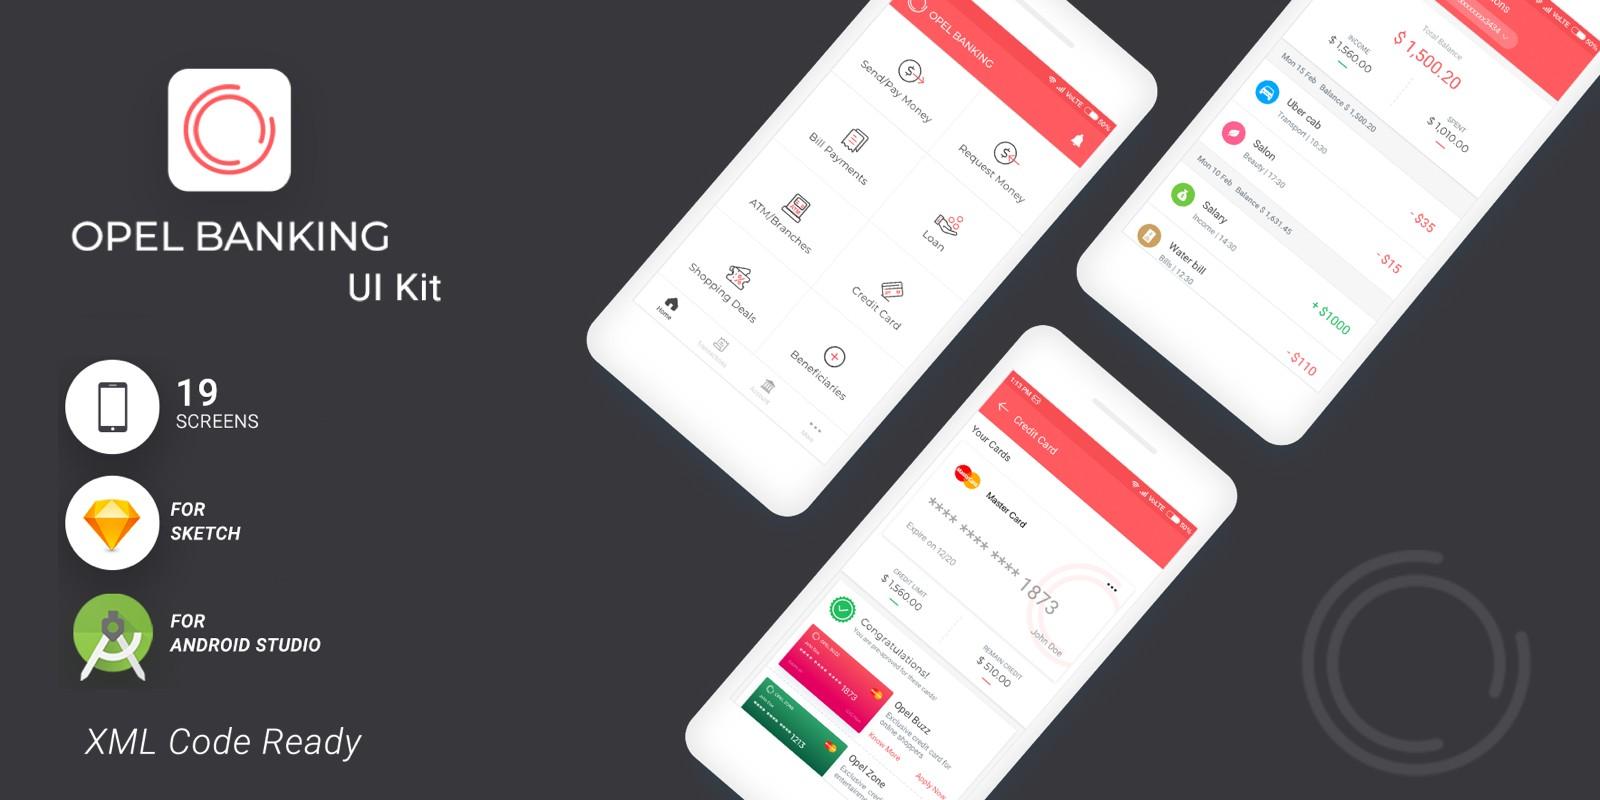 Opel Banking - Android Studio UI Kit